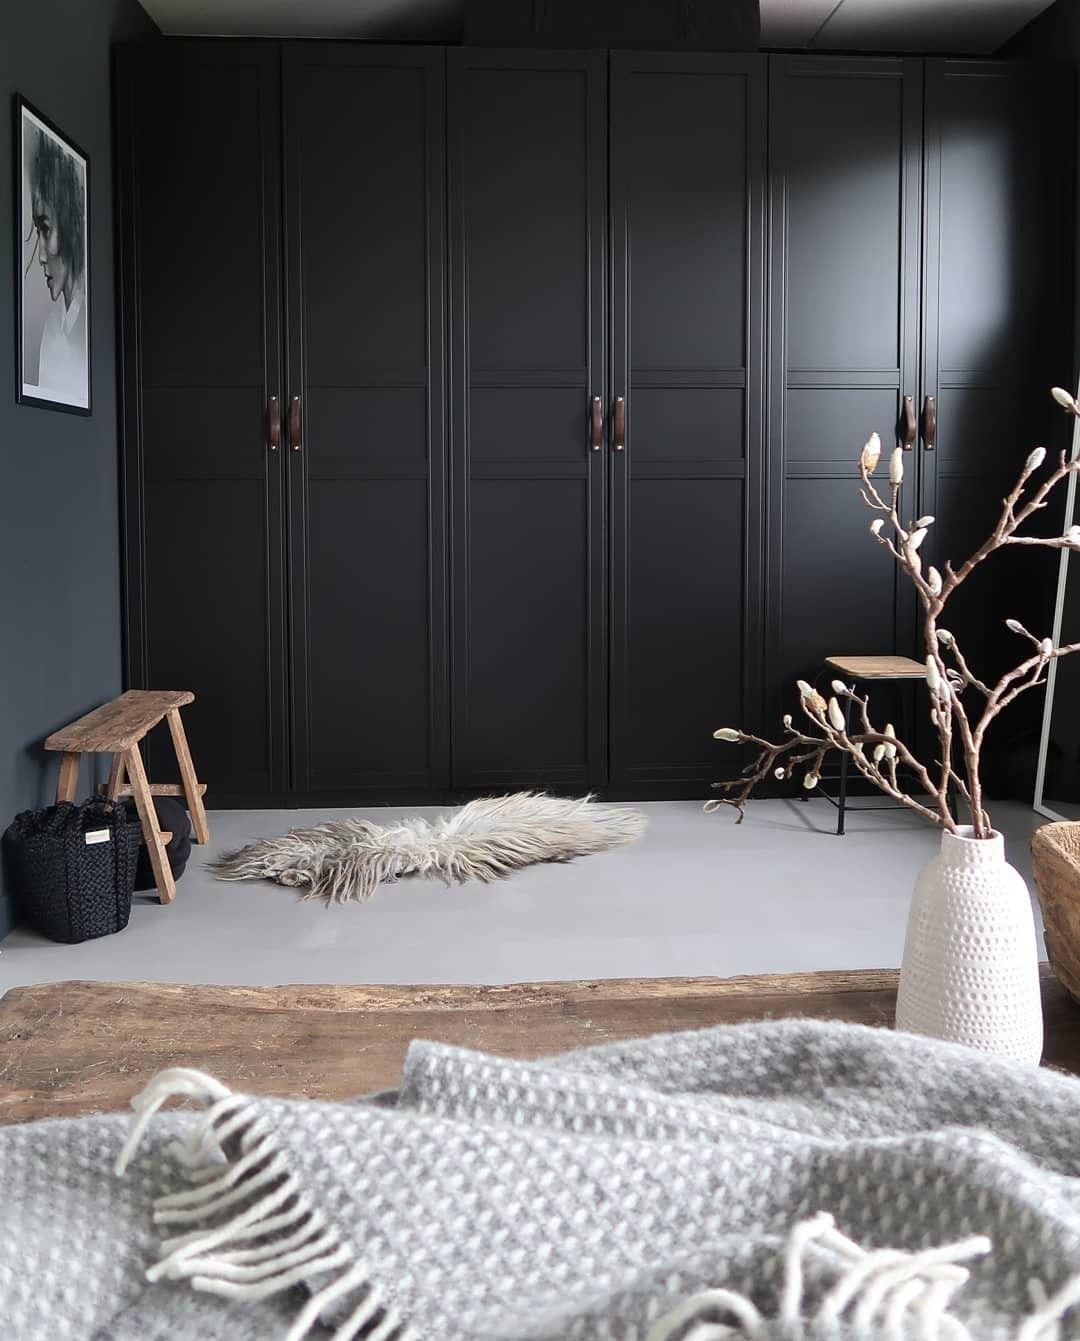 Zwarte Slaapkamer Kast.Ikea Hack Onze Zwarte Ikea Pax Kasten In Love With Our Ikea Pax